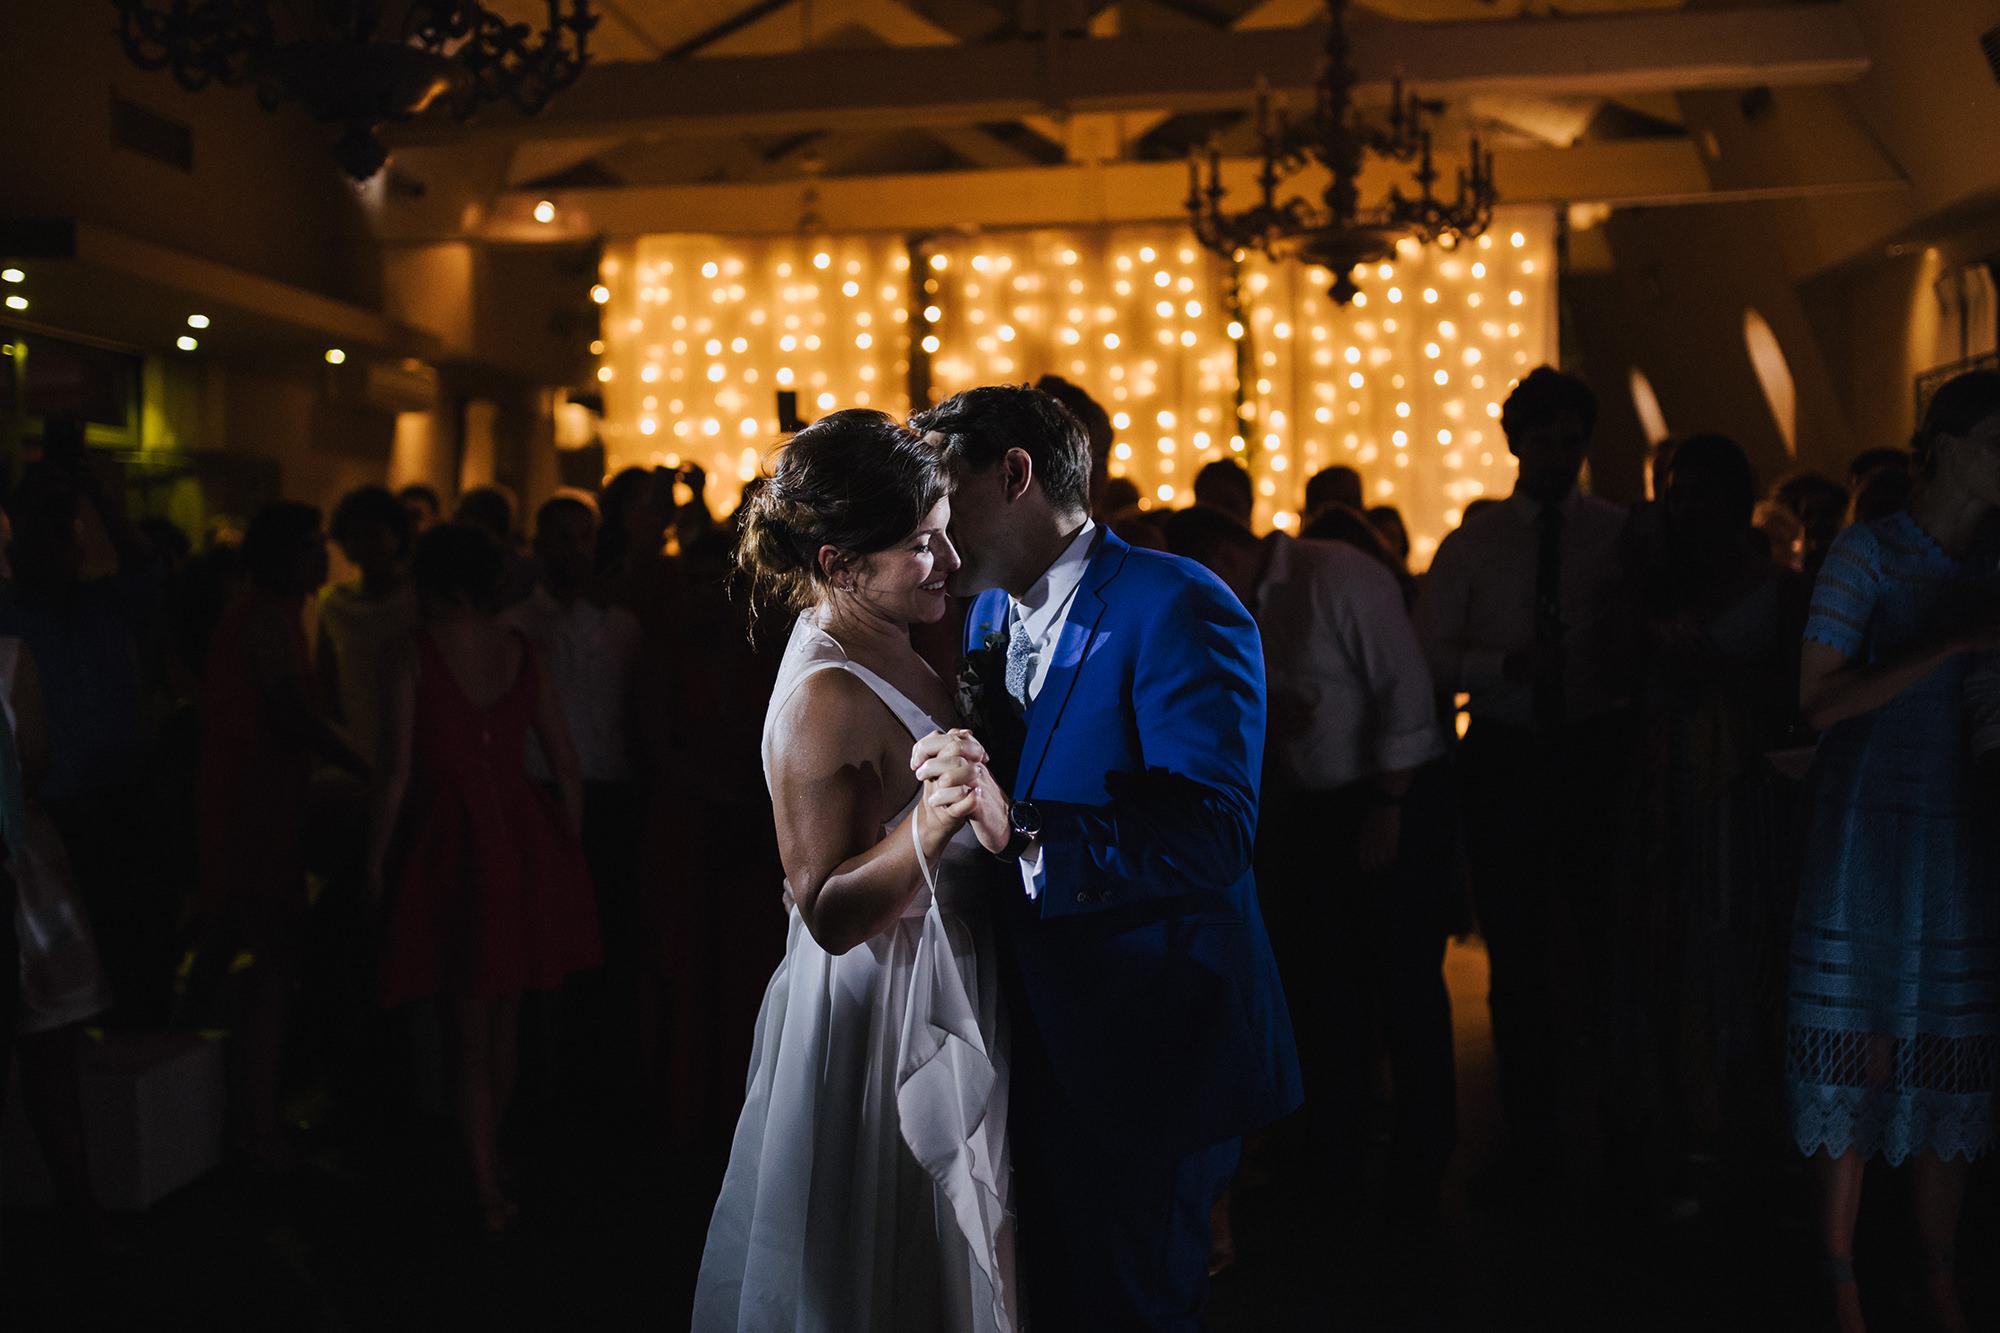 Wedding_Audrey+michael_tour_vaucros_provence_neupapphotography-702.jpg